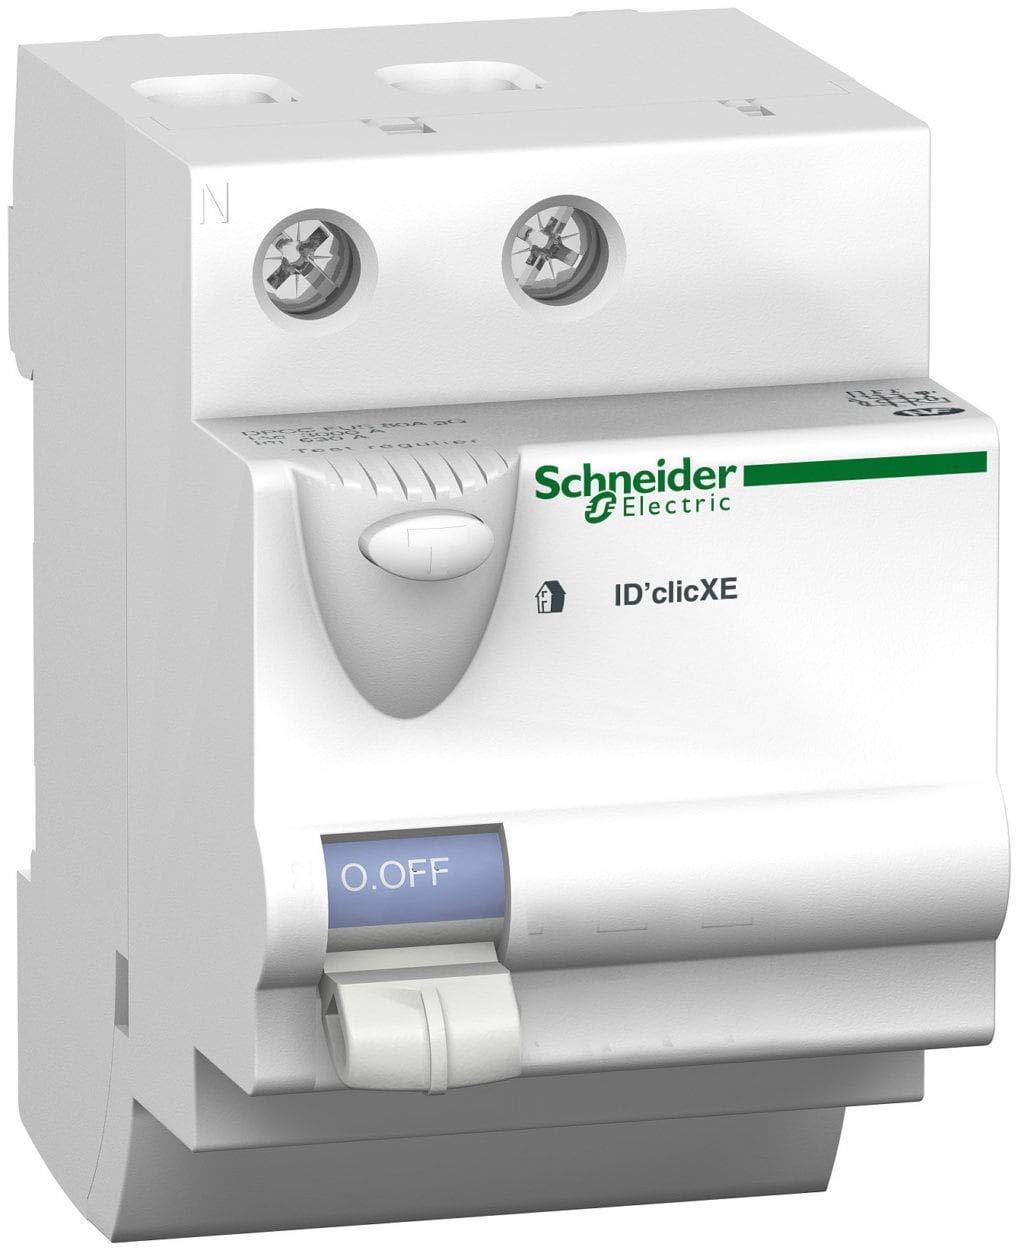 SCHNEIDER - Interrupteur diffé rentiel embrochable ID'Clic 40A 30mA type AC - Duoline - 16160 SCHNEIDER - Interrupteur différentiel